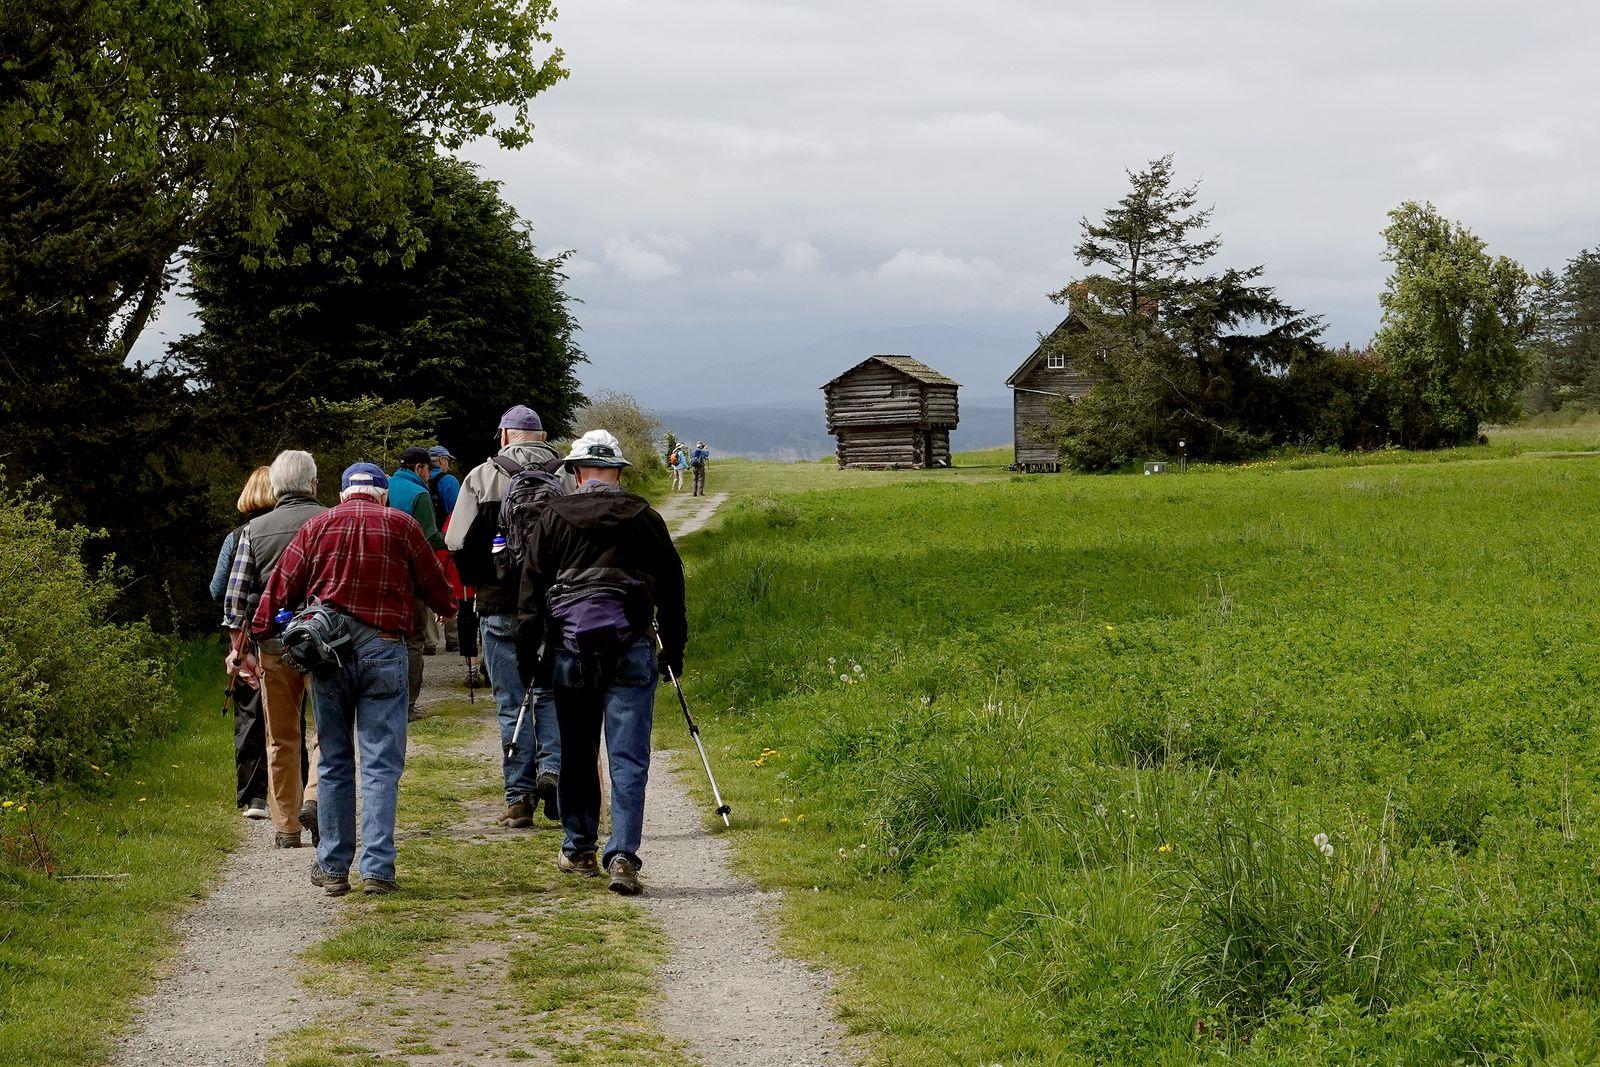 Heading towards the original homesteader's house